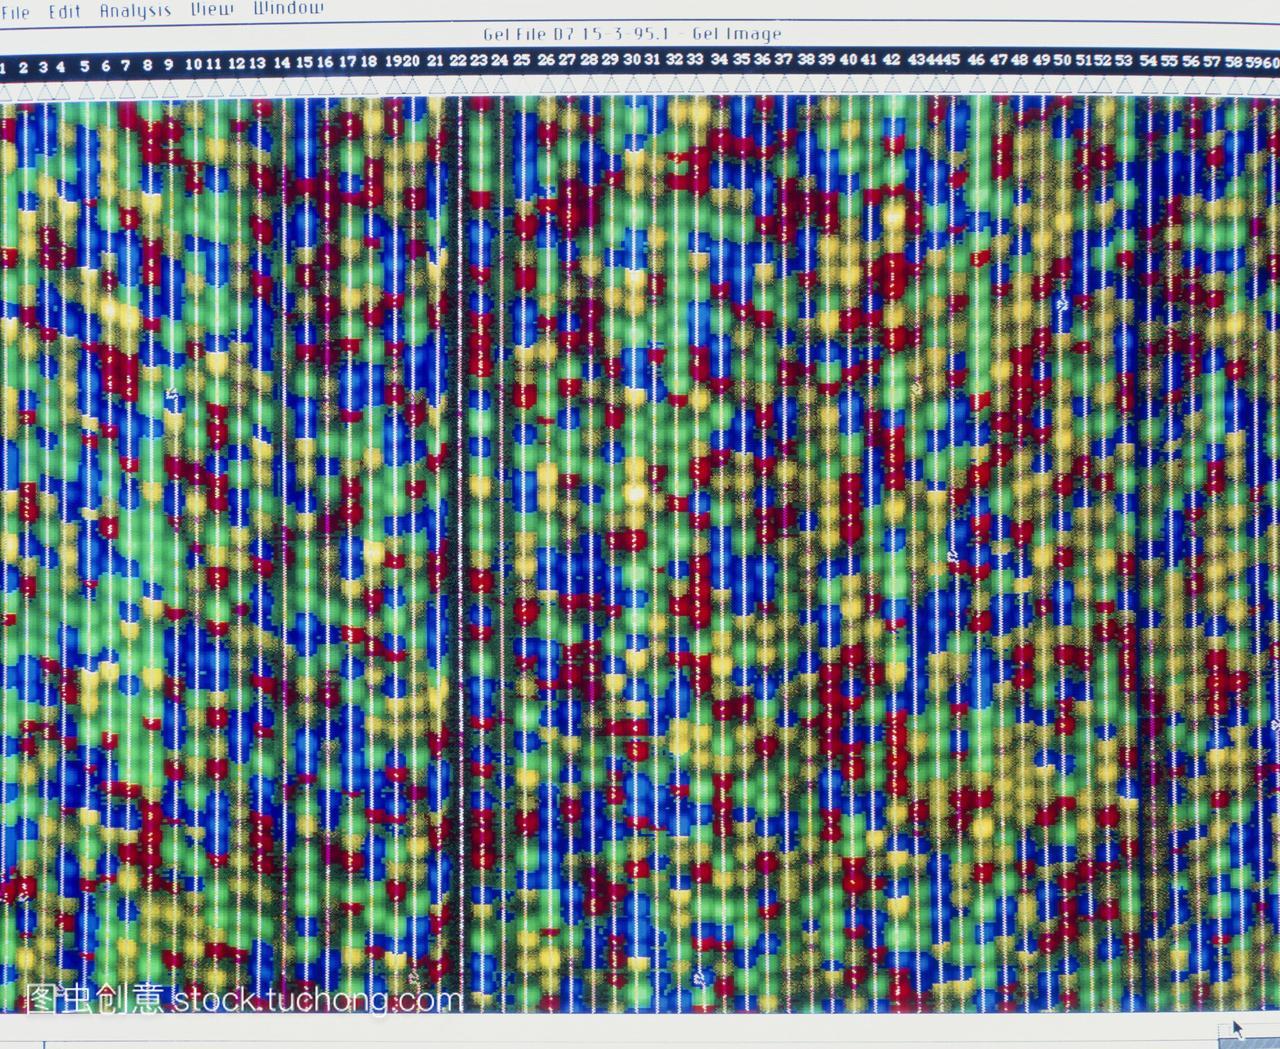 dna显示dna脱氧核糖核酸的计算机测序v视频模视频打深圳孩子图片